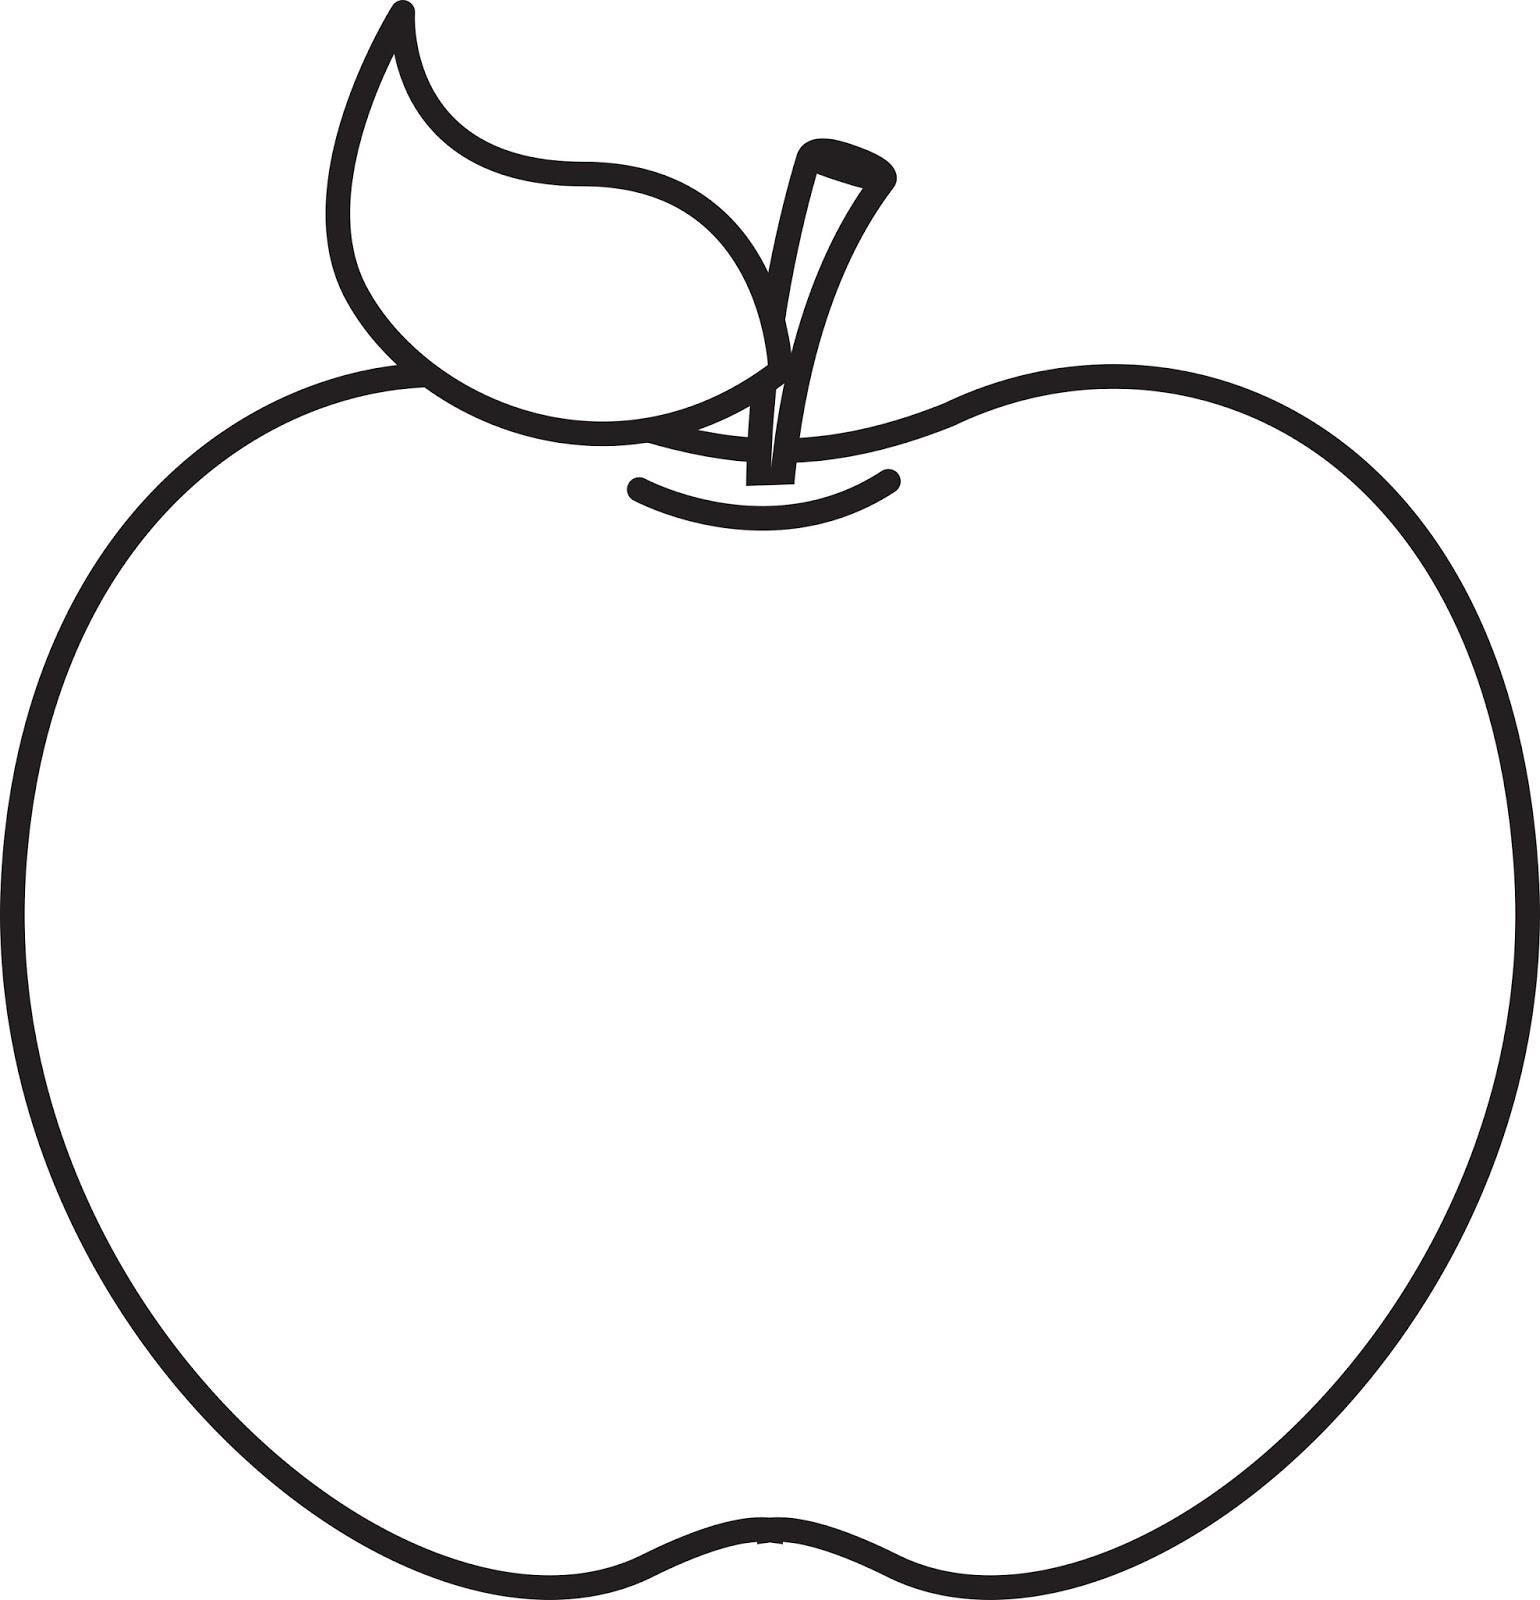 1540x1600 Cute Apple Clip Art Free Clipart Images 2